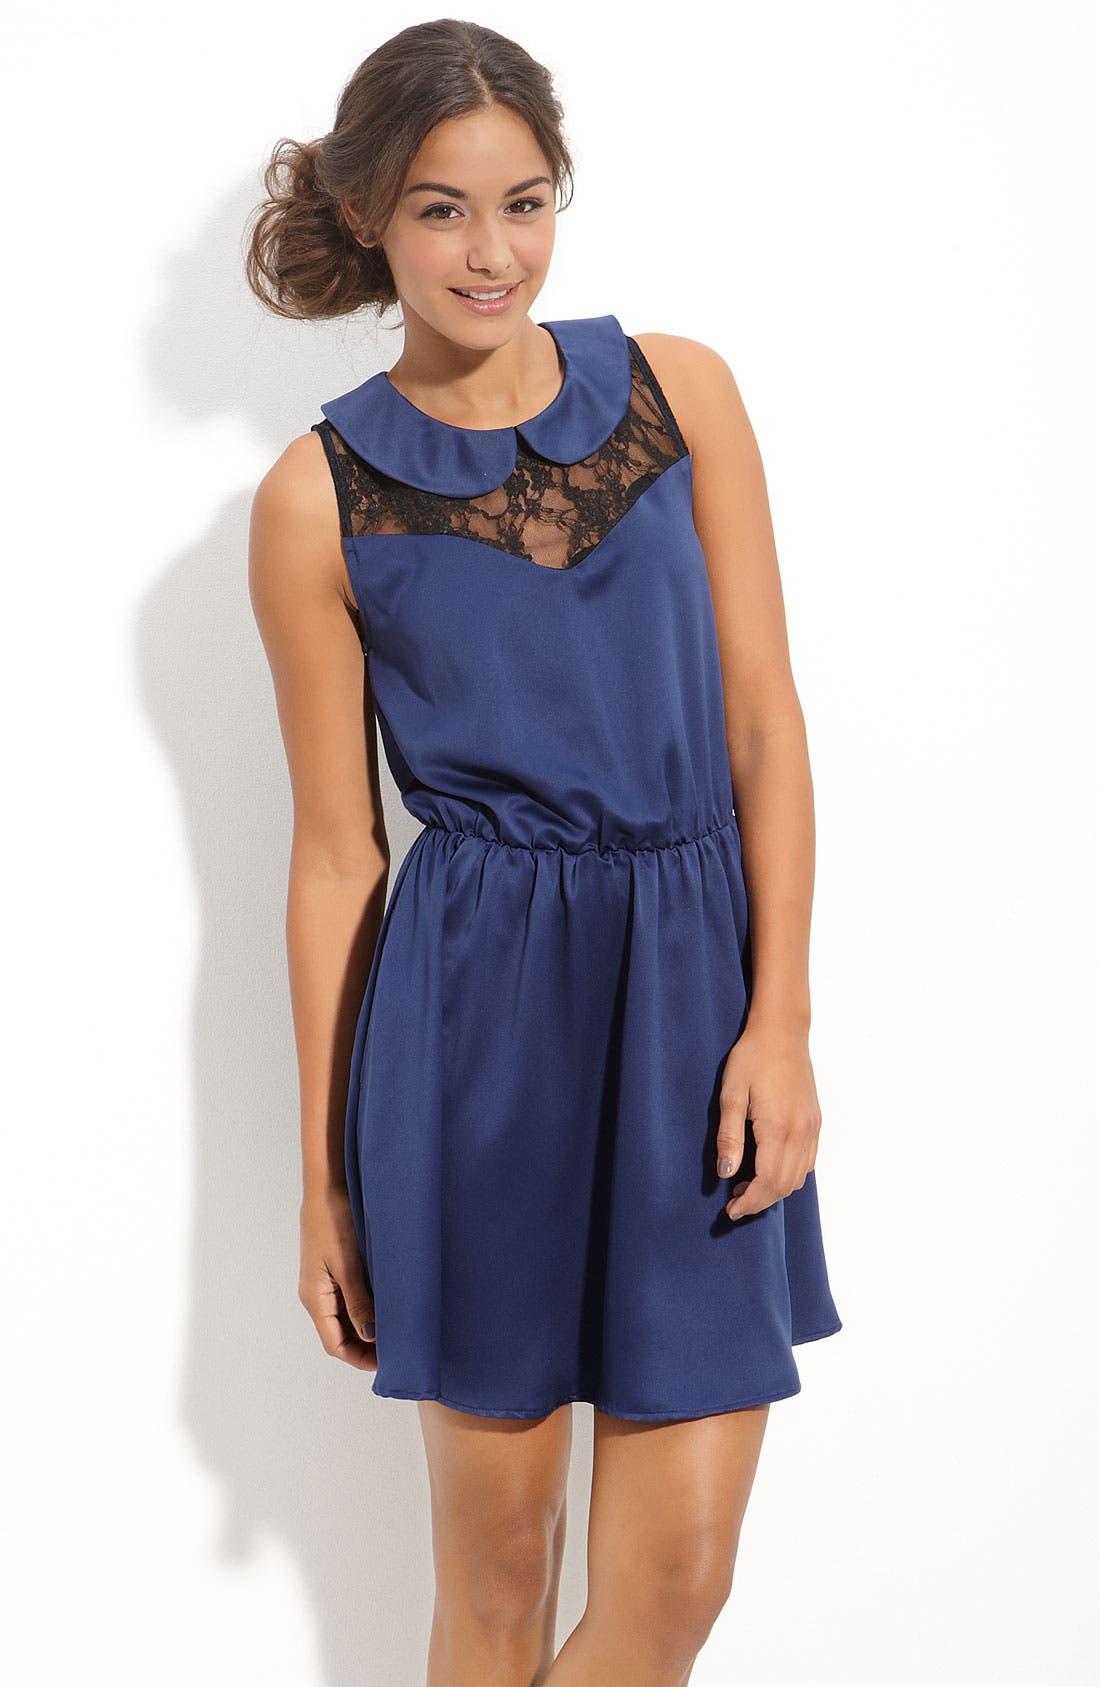 Main Image - Mimi Chica Lace Inset Dress (Juniors)